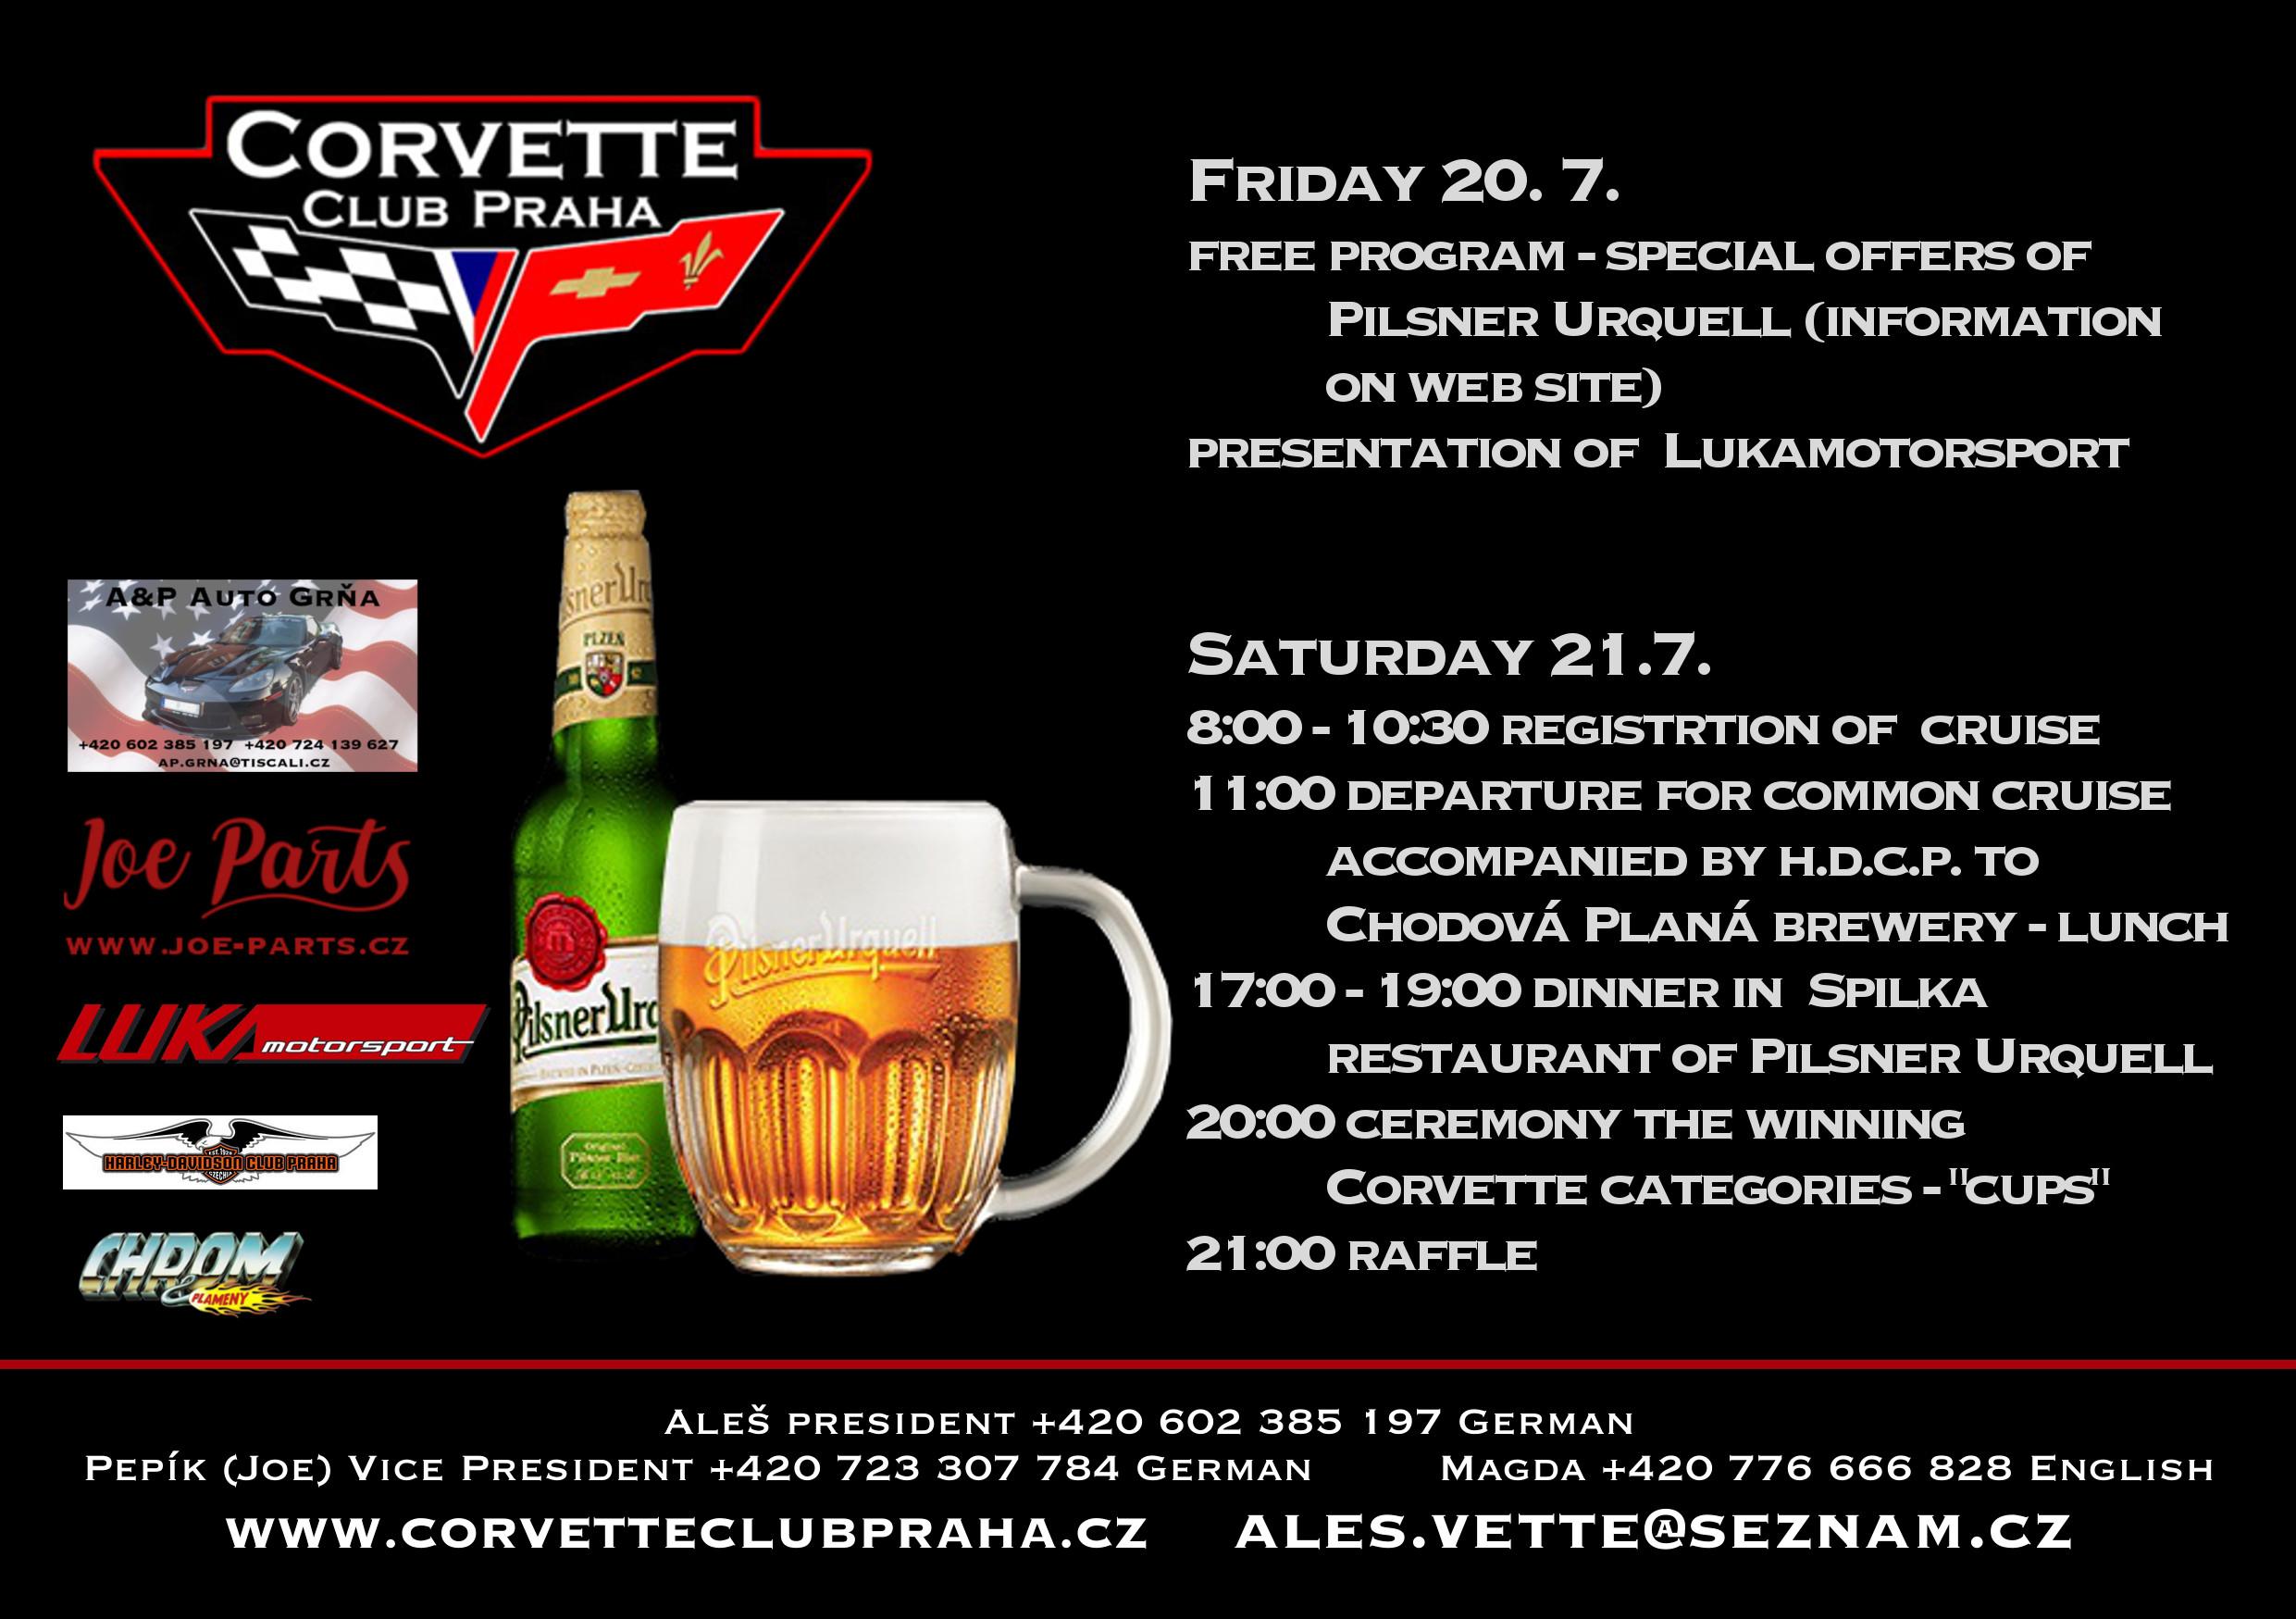 18th International Meeting of Corvette Club Praha - Program